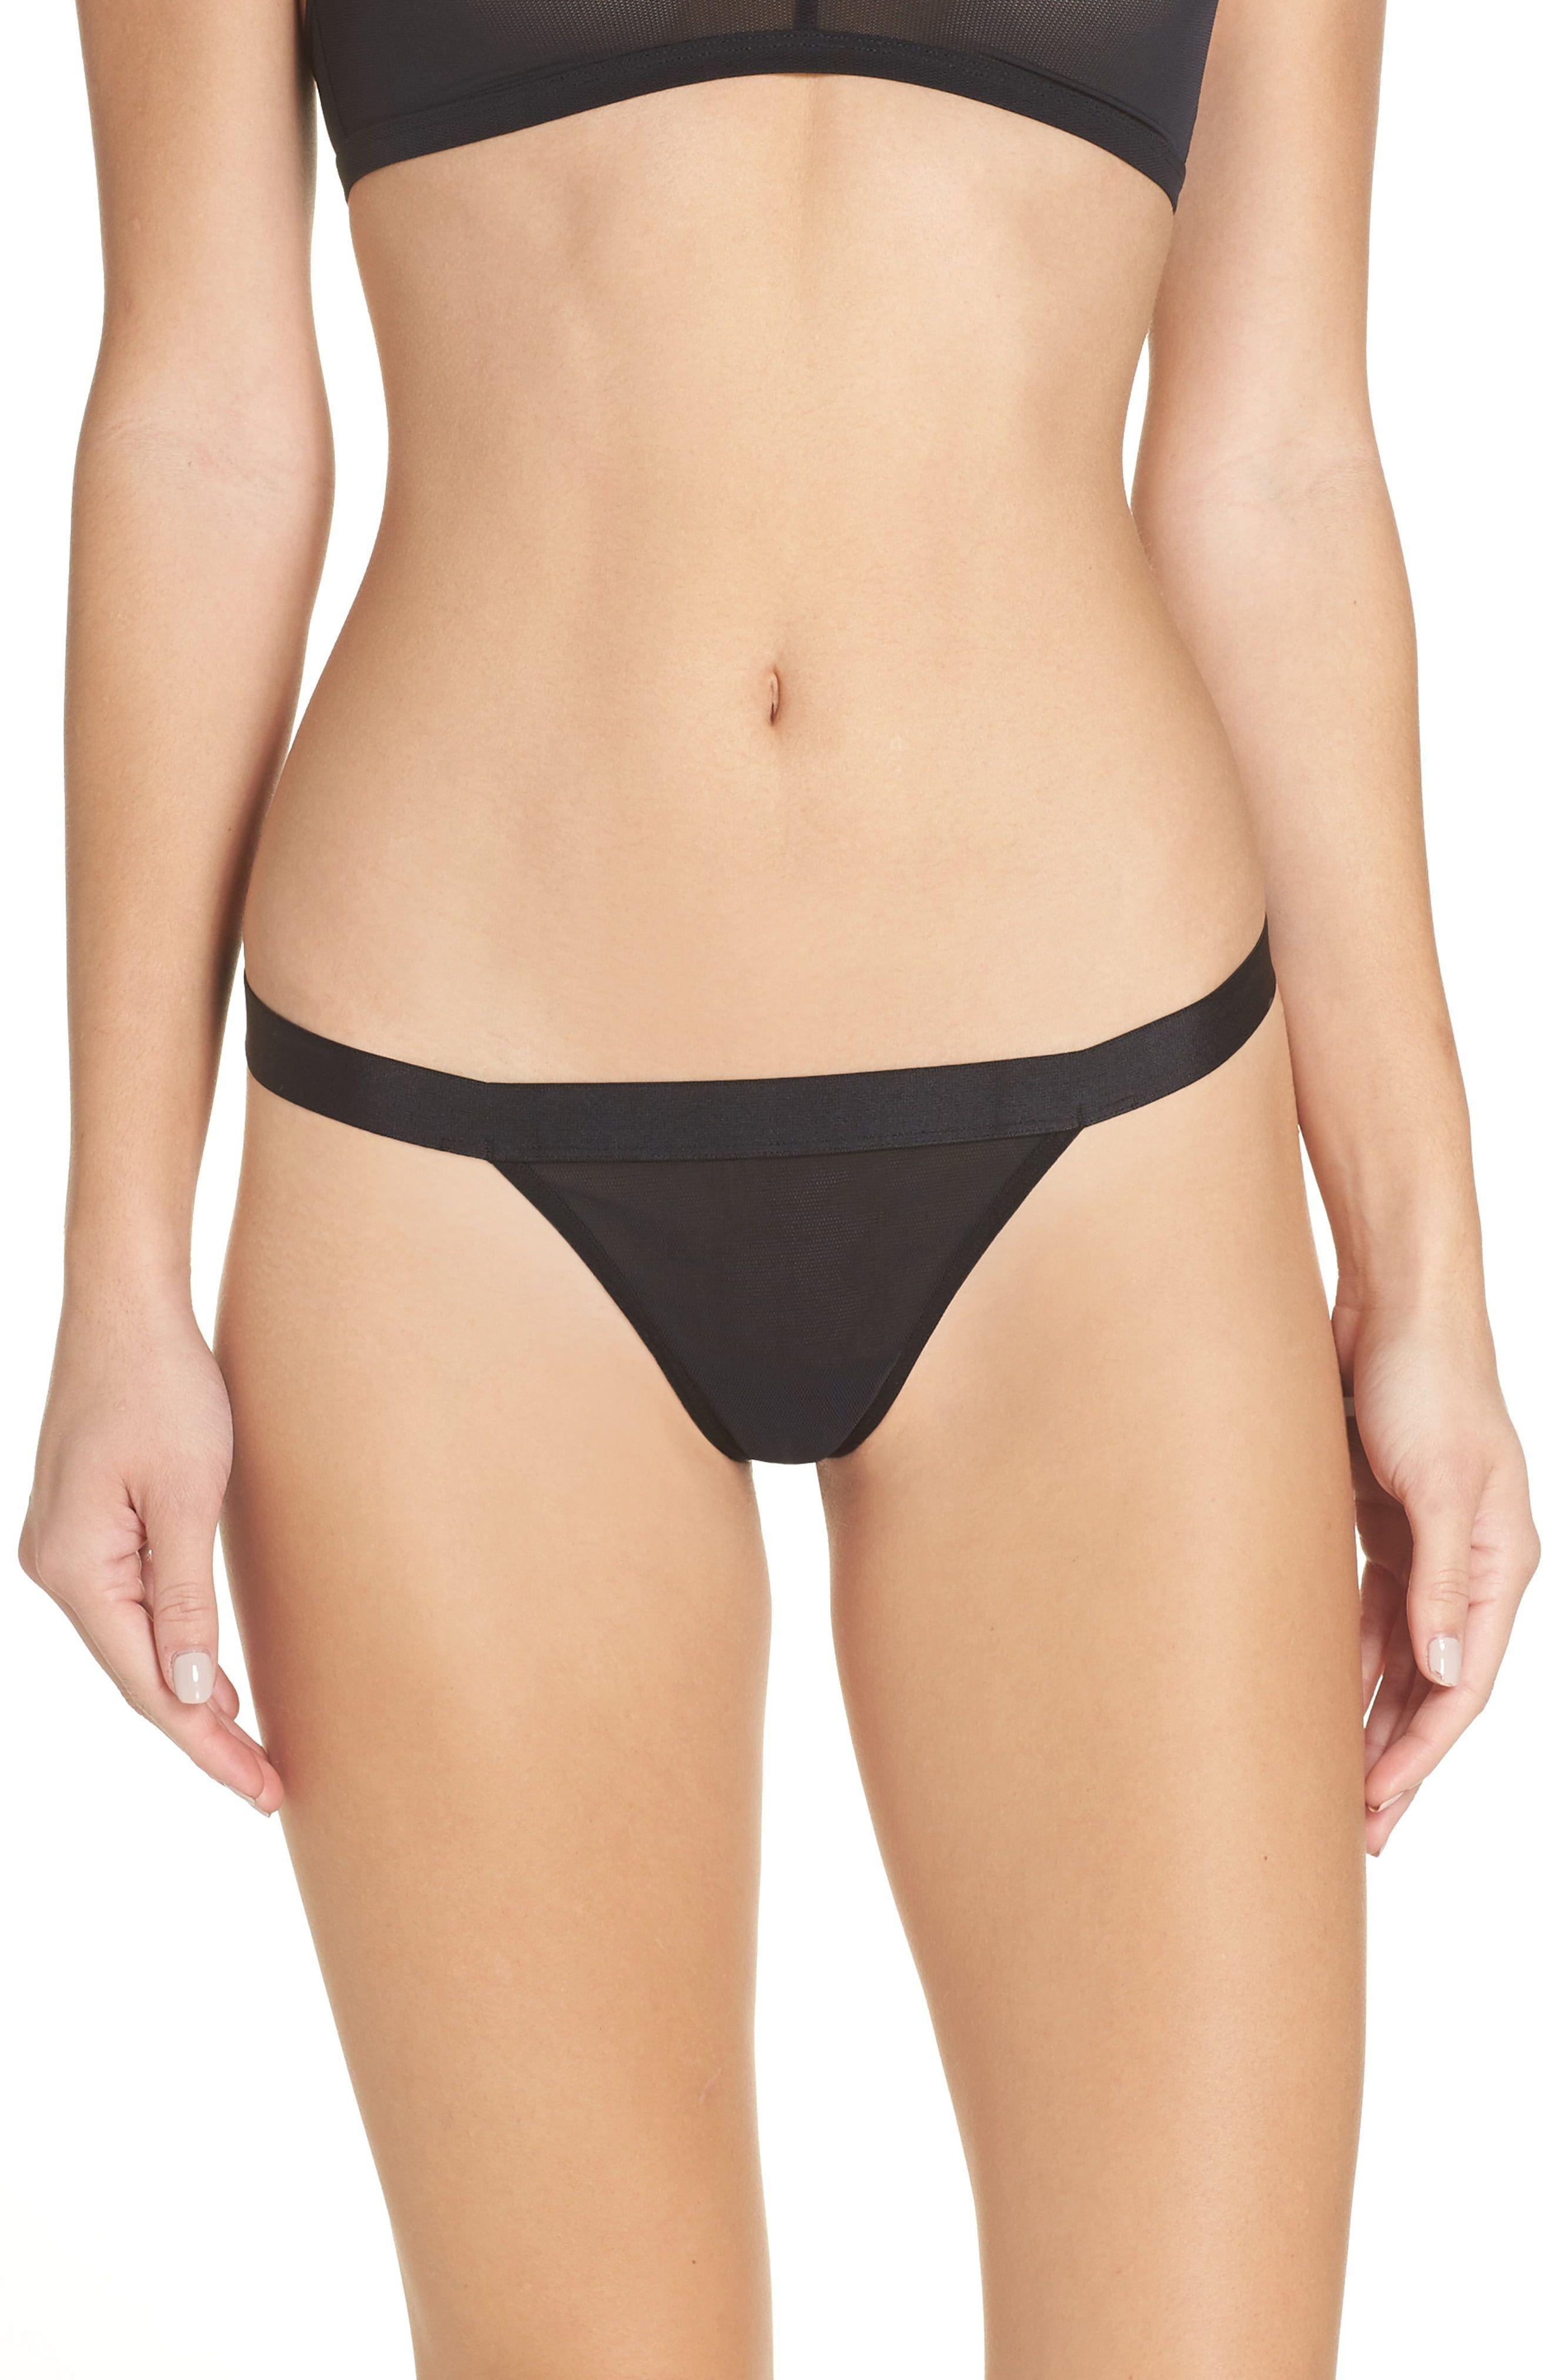 Cricket recommend best of Sewing patterns brazilian bikini